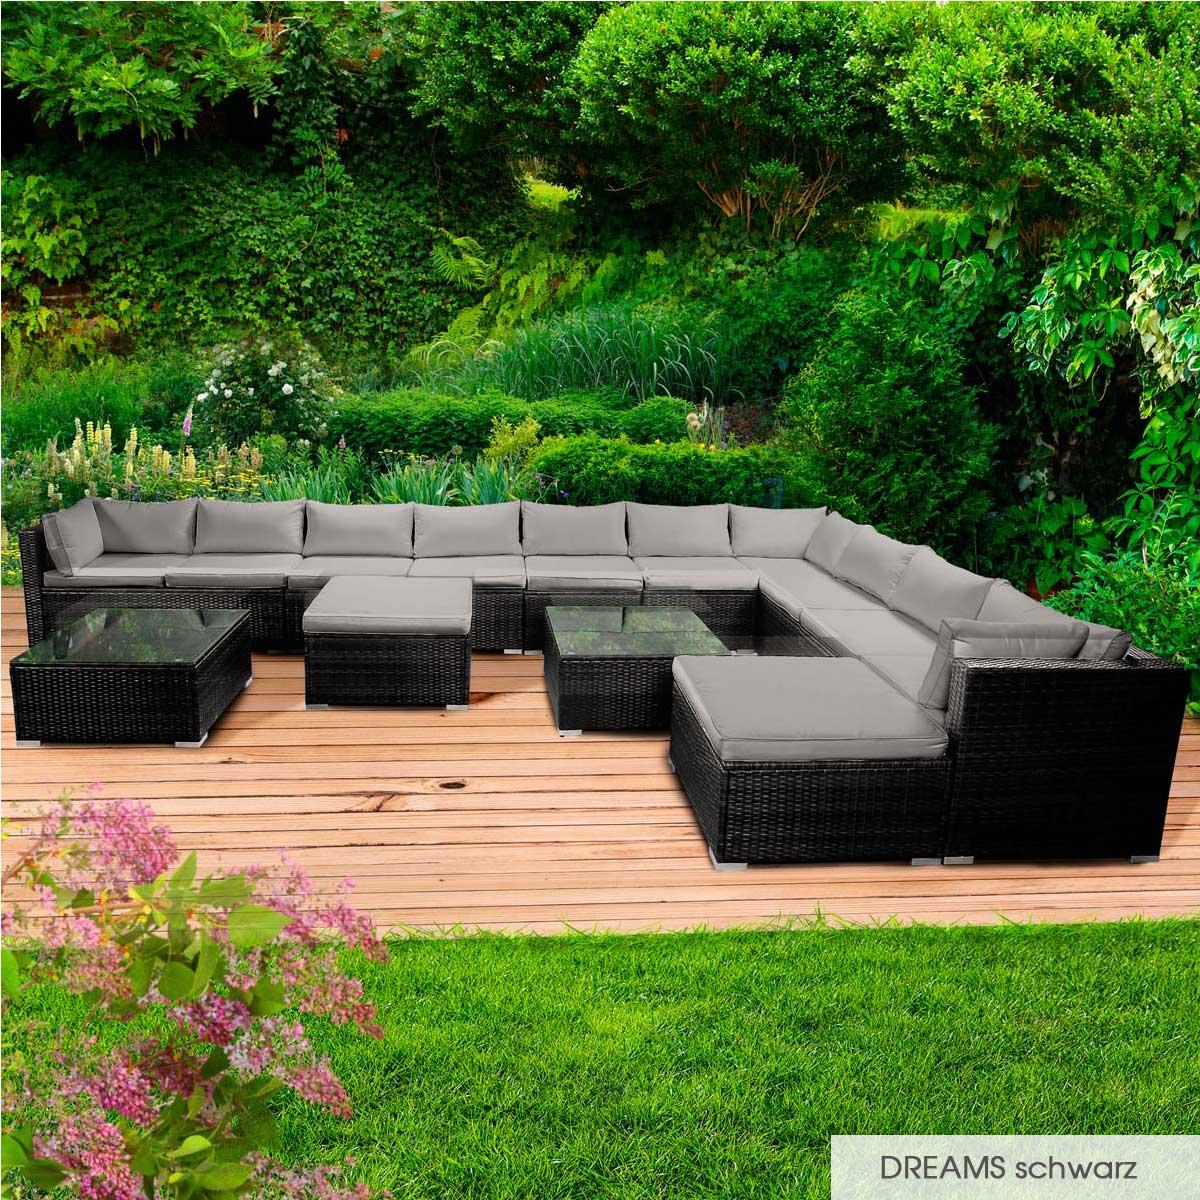 Gartenmoebel-Poly-Rattan-Lounge-Moebel-Sitzgarnitur-Gartengarnitur-Sitzgruppe-Sofa Indexbild 69